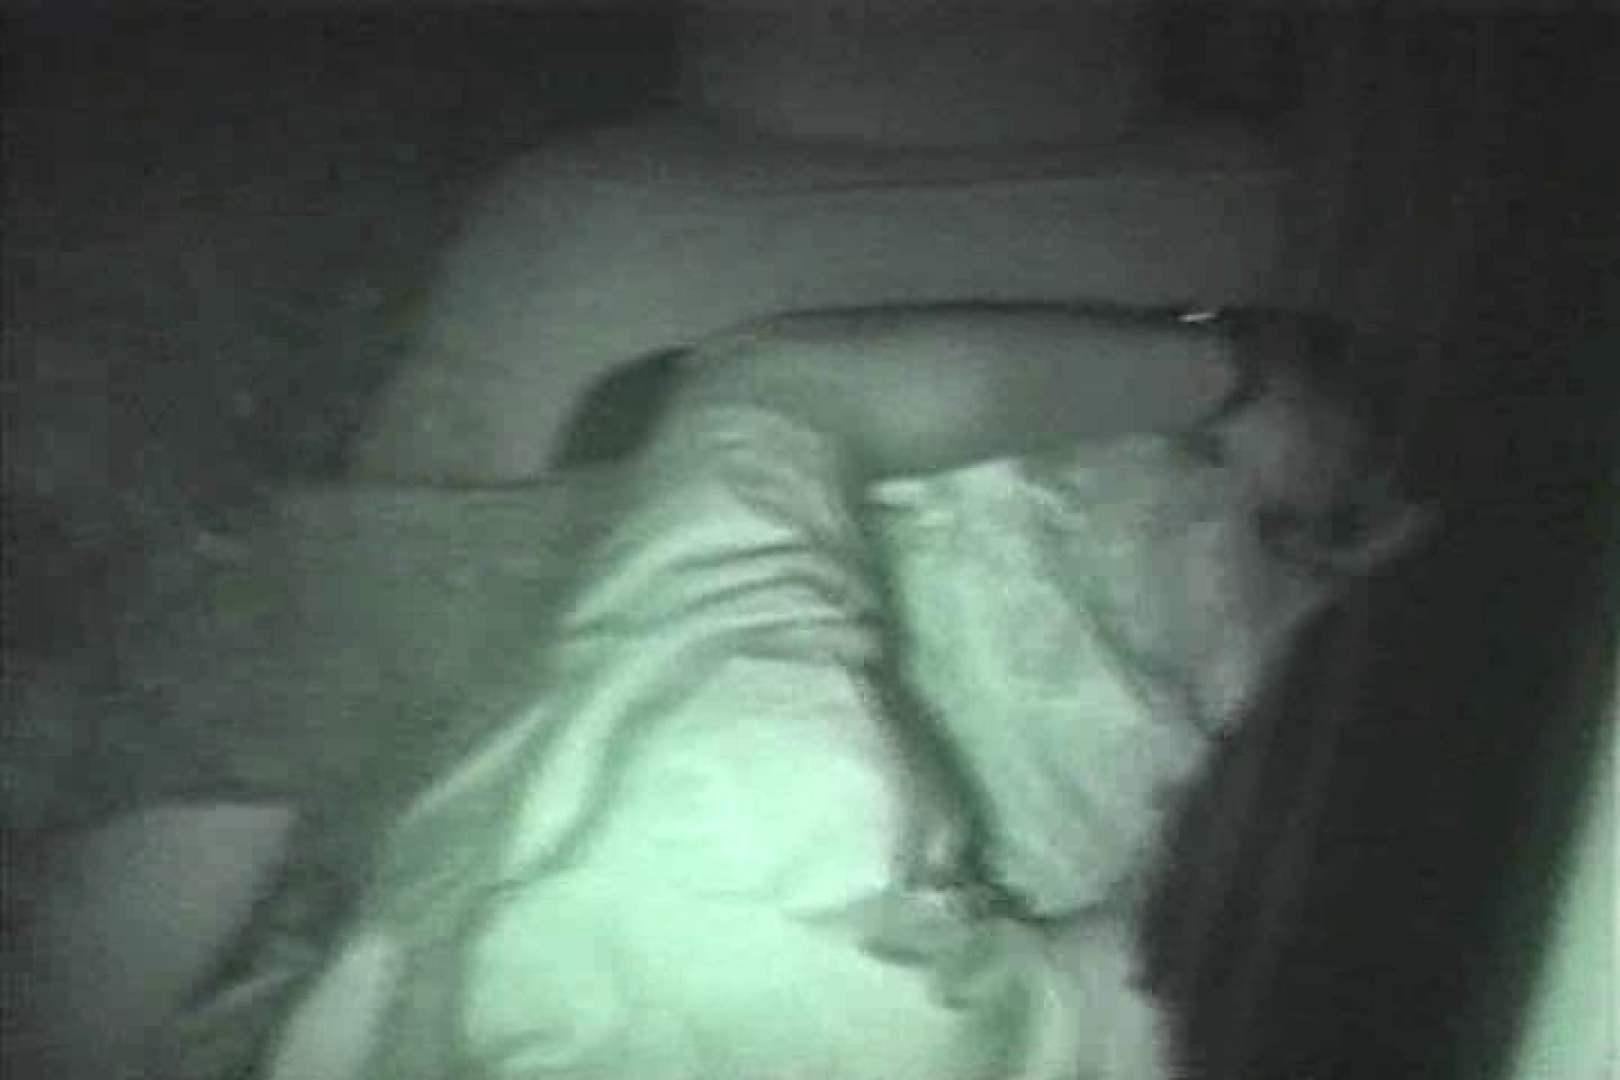 MASAさんの待ち伏せ撮り! 赤外線カーセックスVol.11 お姉さん丸裸 ワレメ無修正動画無料 77pic 11